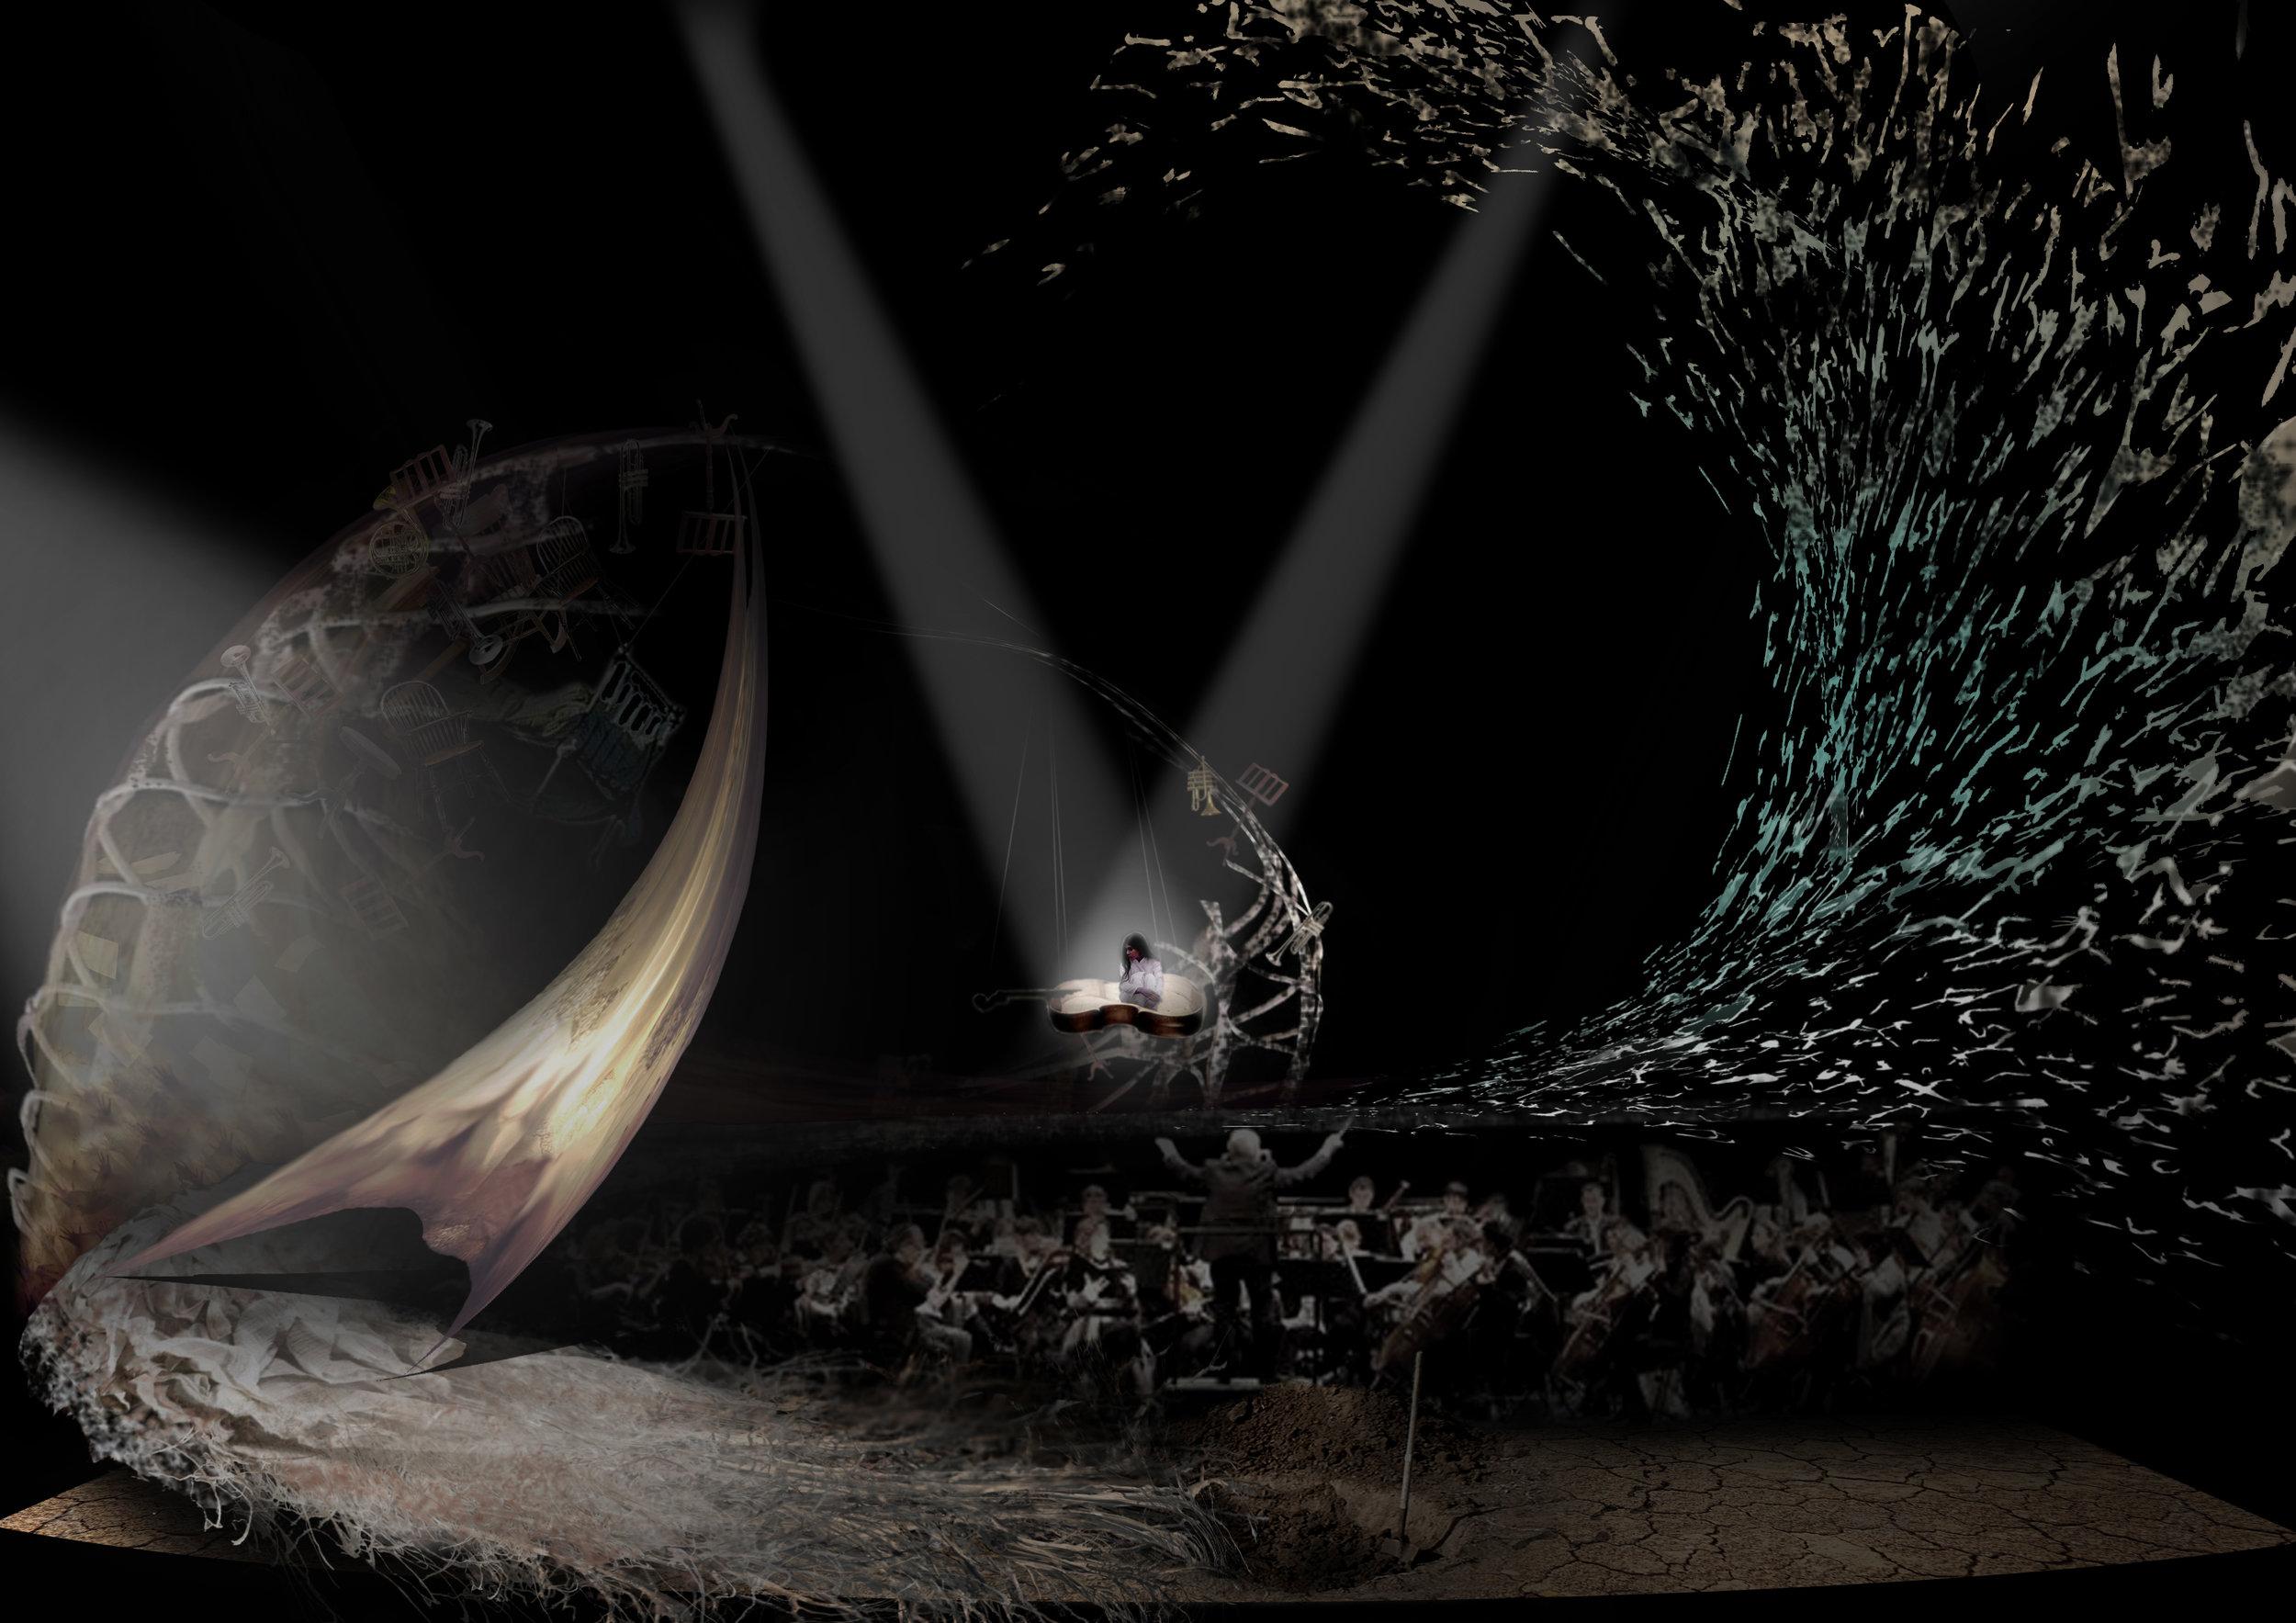 CONCEPT ARTWORK 3 - The Boat - Photoshop Render